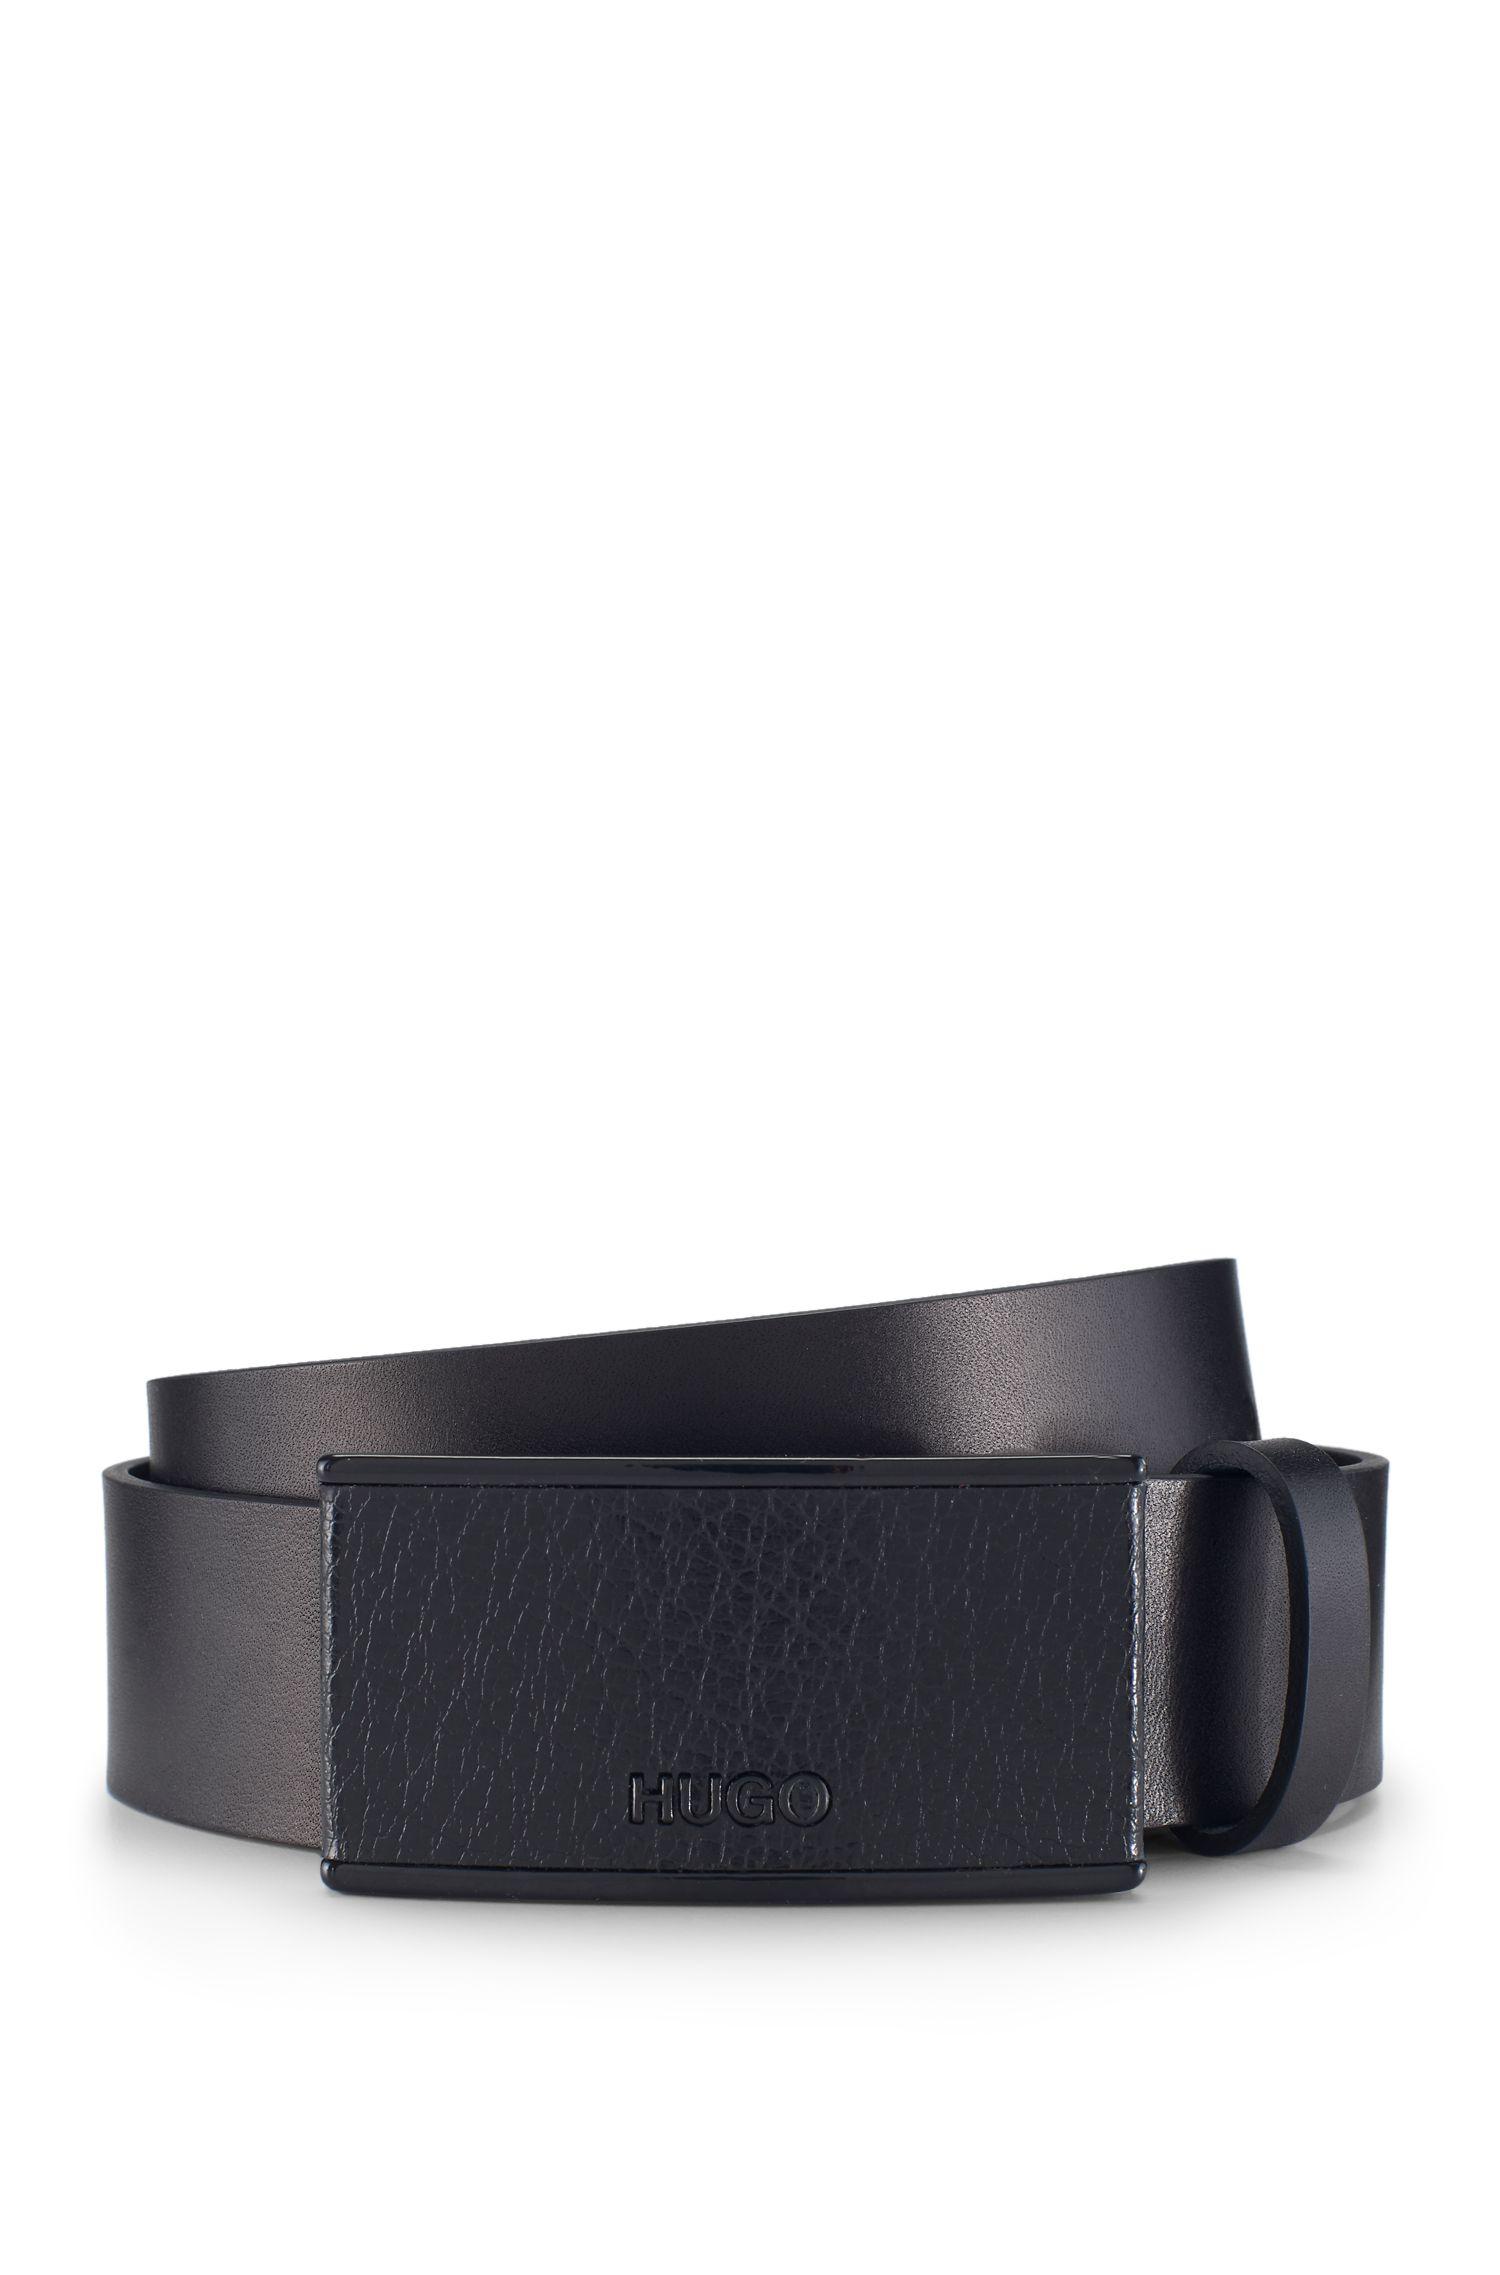 'Gerdy' | Leather Belt